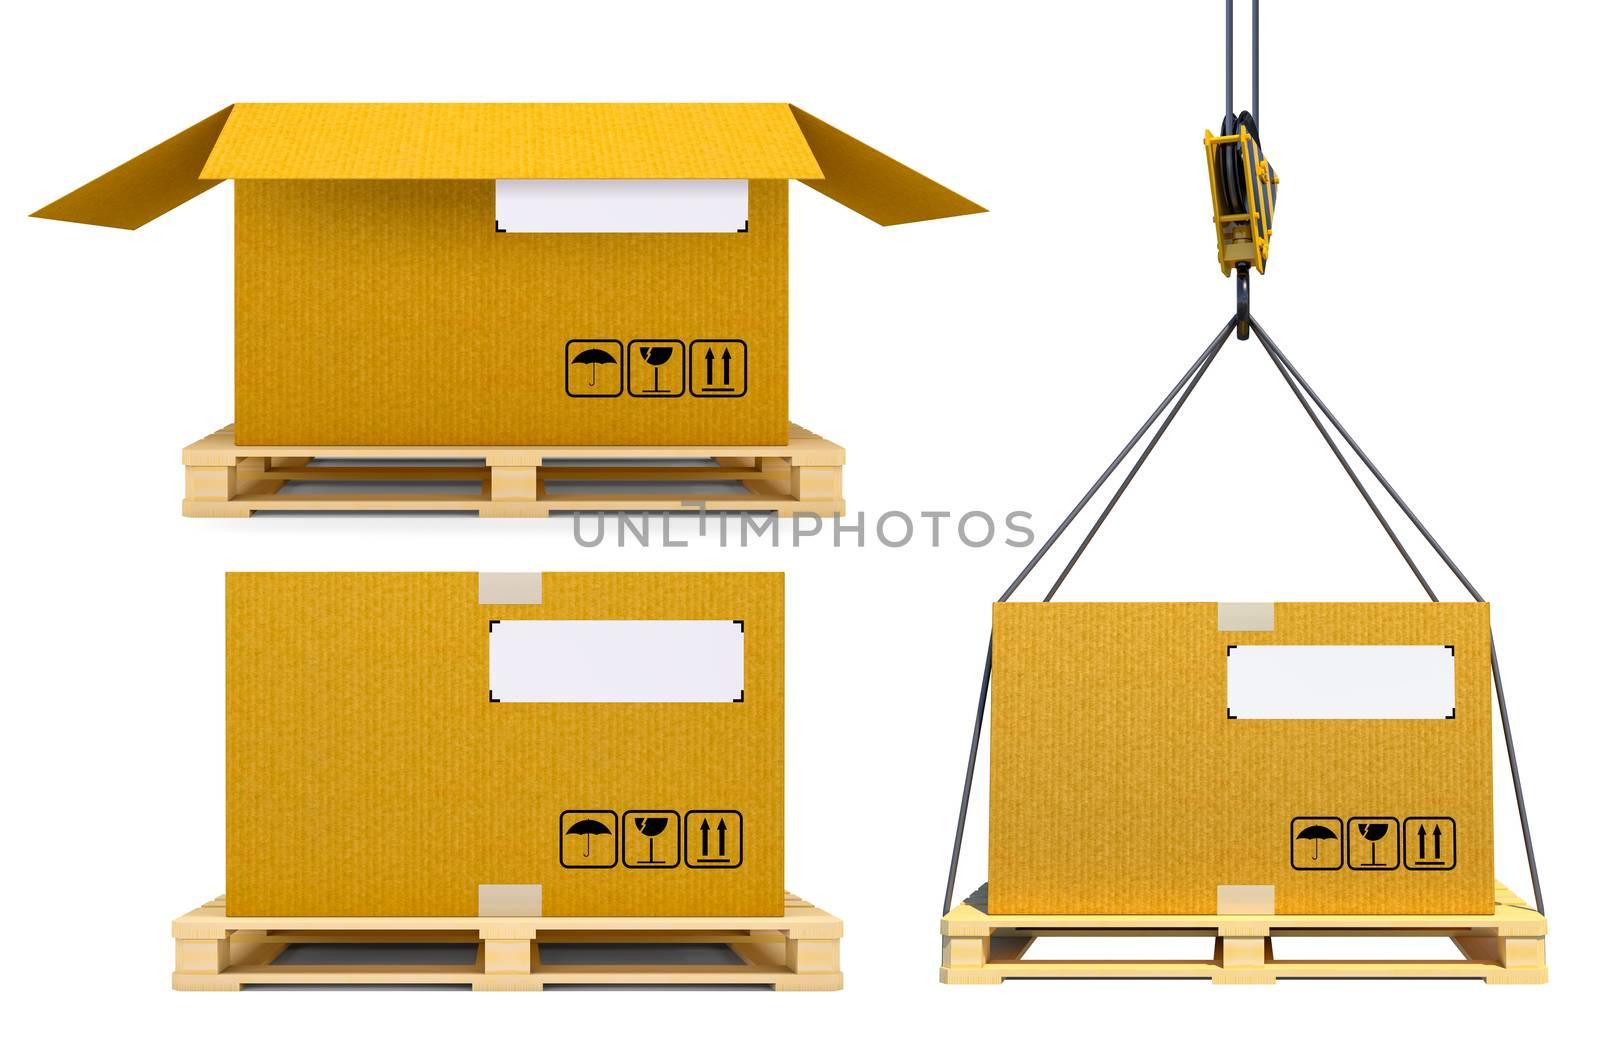 Cardboard boxes on pallet. Cargo, delivery and transportation concept. 3d illustration